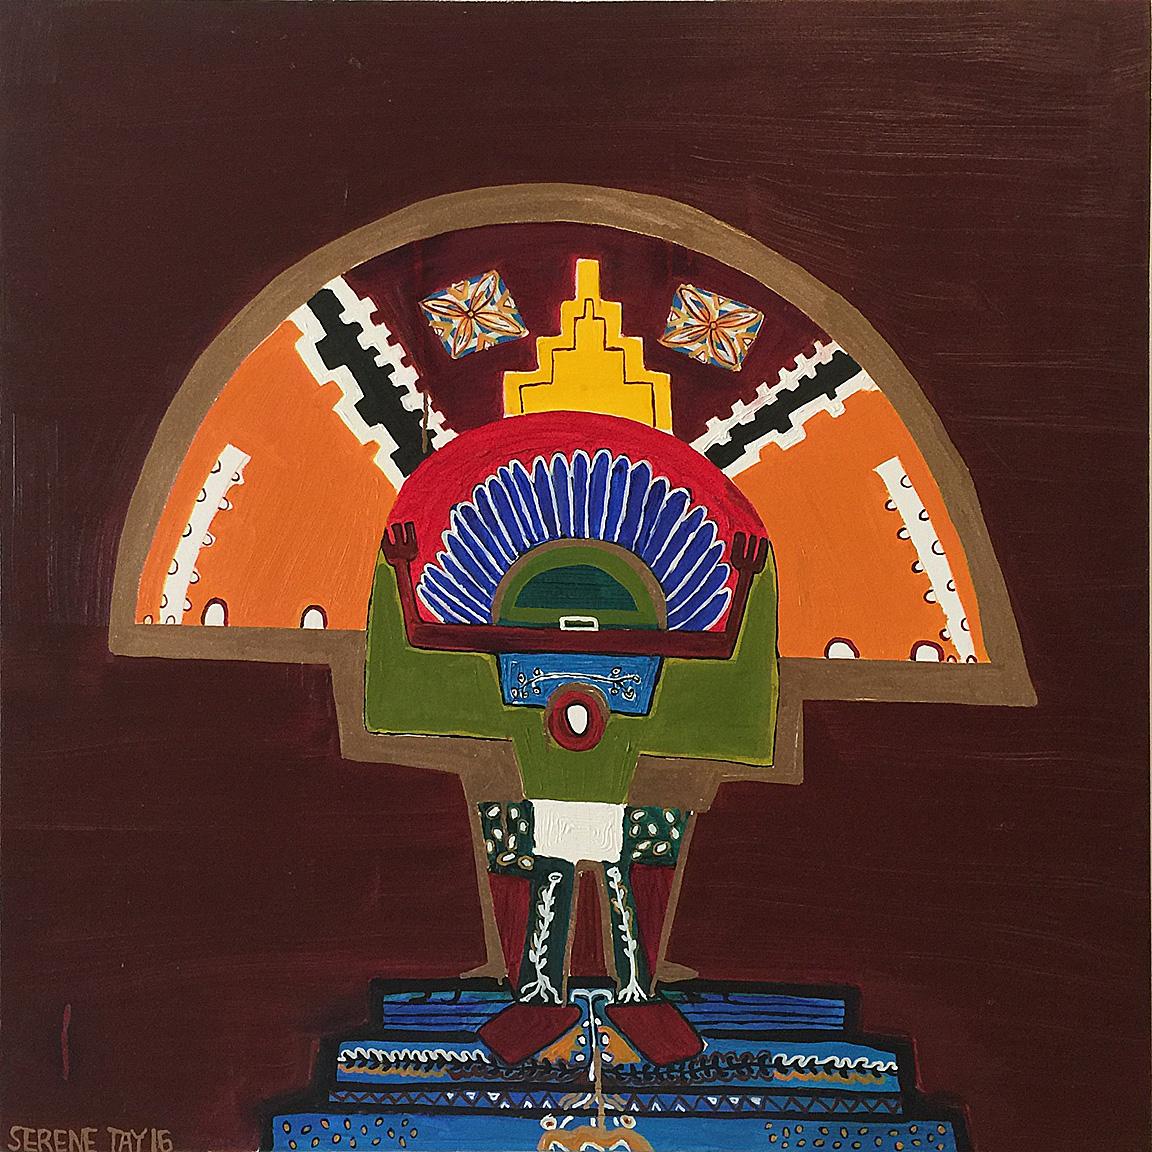 Homage to Pueblo  Serene Hai Thang Whakatau Tay, oil on canvas (2016)